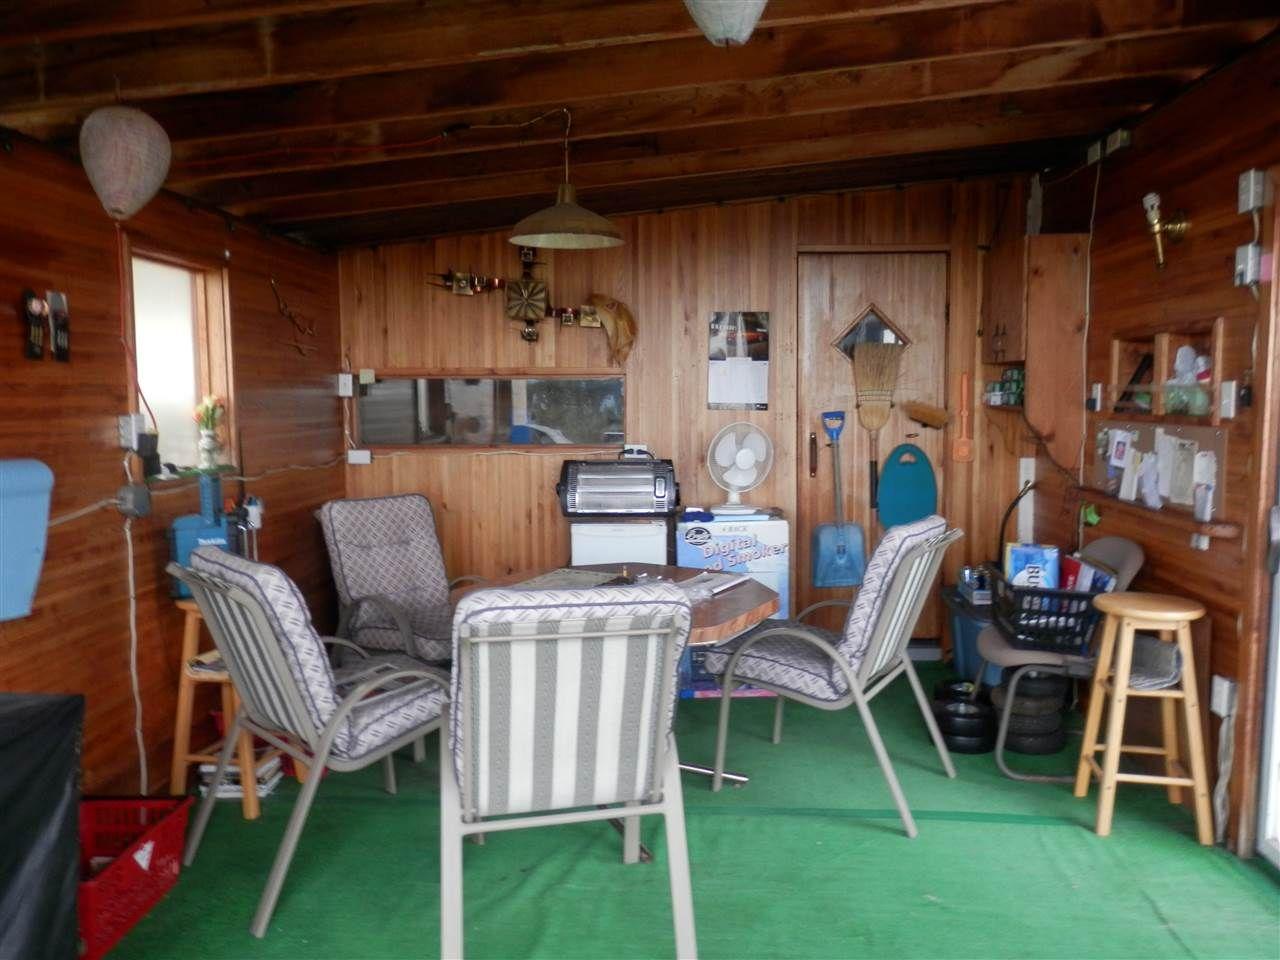 Photo 18: Photos: 935 HODGSON Road in Williams Lake: Esler/Dog Creek House for sale (Williams Lake (Zone 27))  : MLS®# R2414109